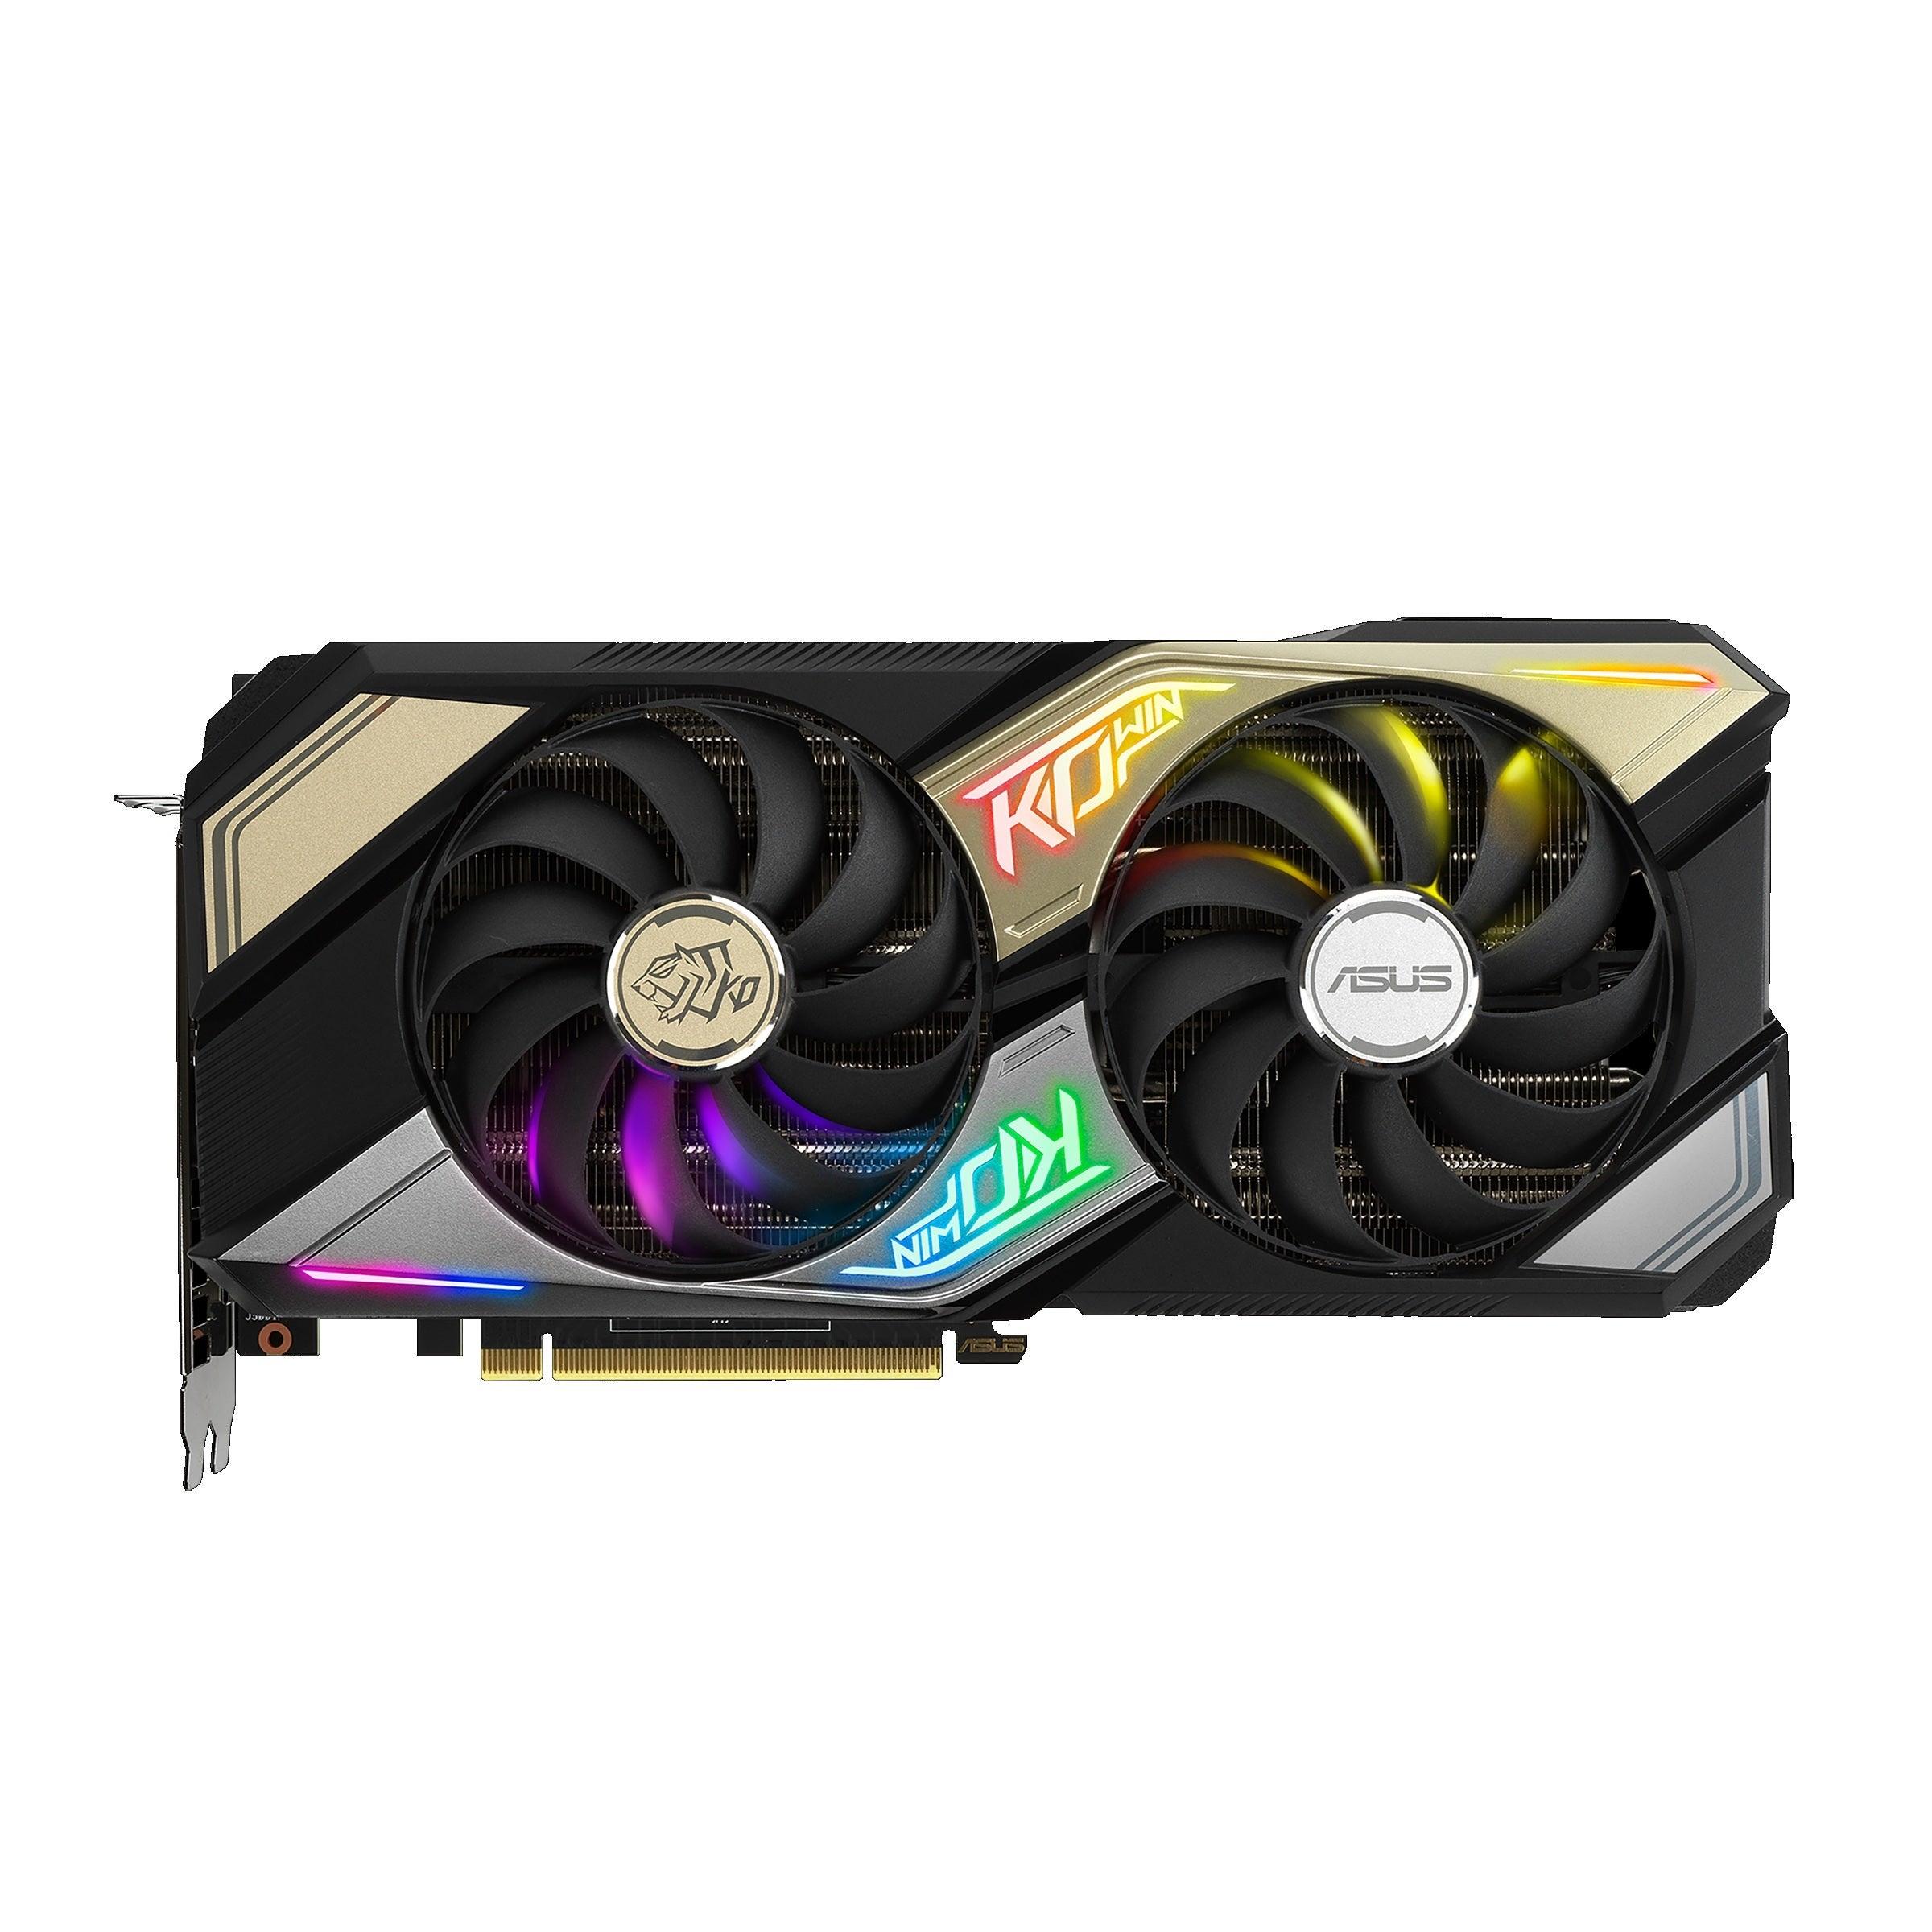 Asus KO GeForce RTX 3070 V2 Graphics Card